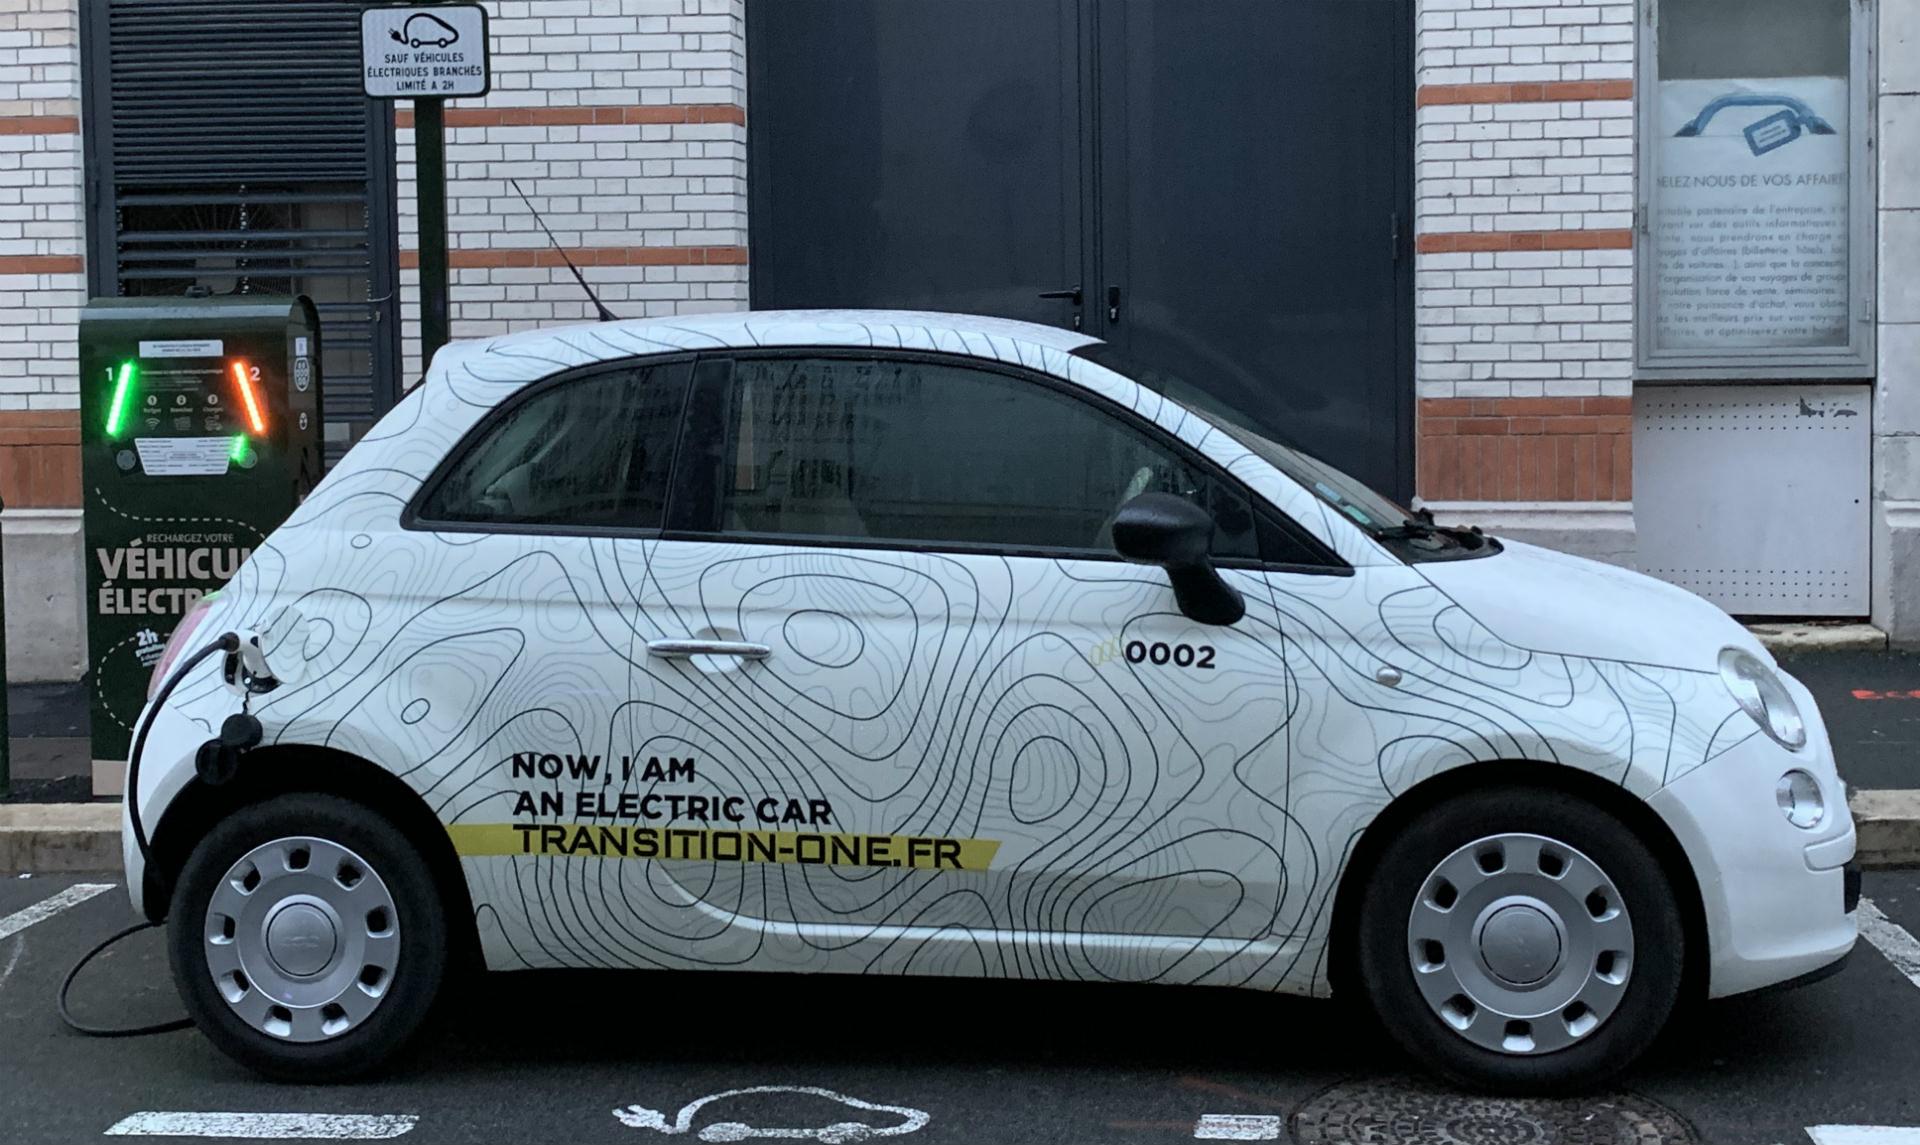 Gallery Transition-One Car Retrofit Technology 4